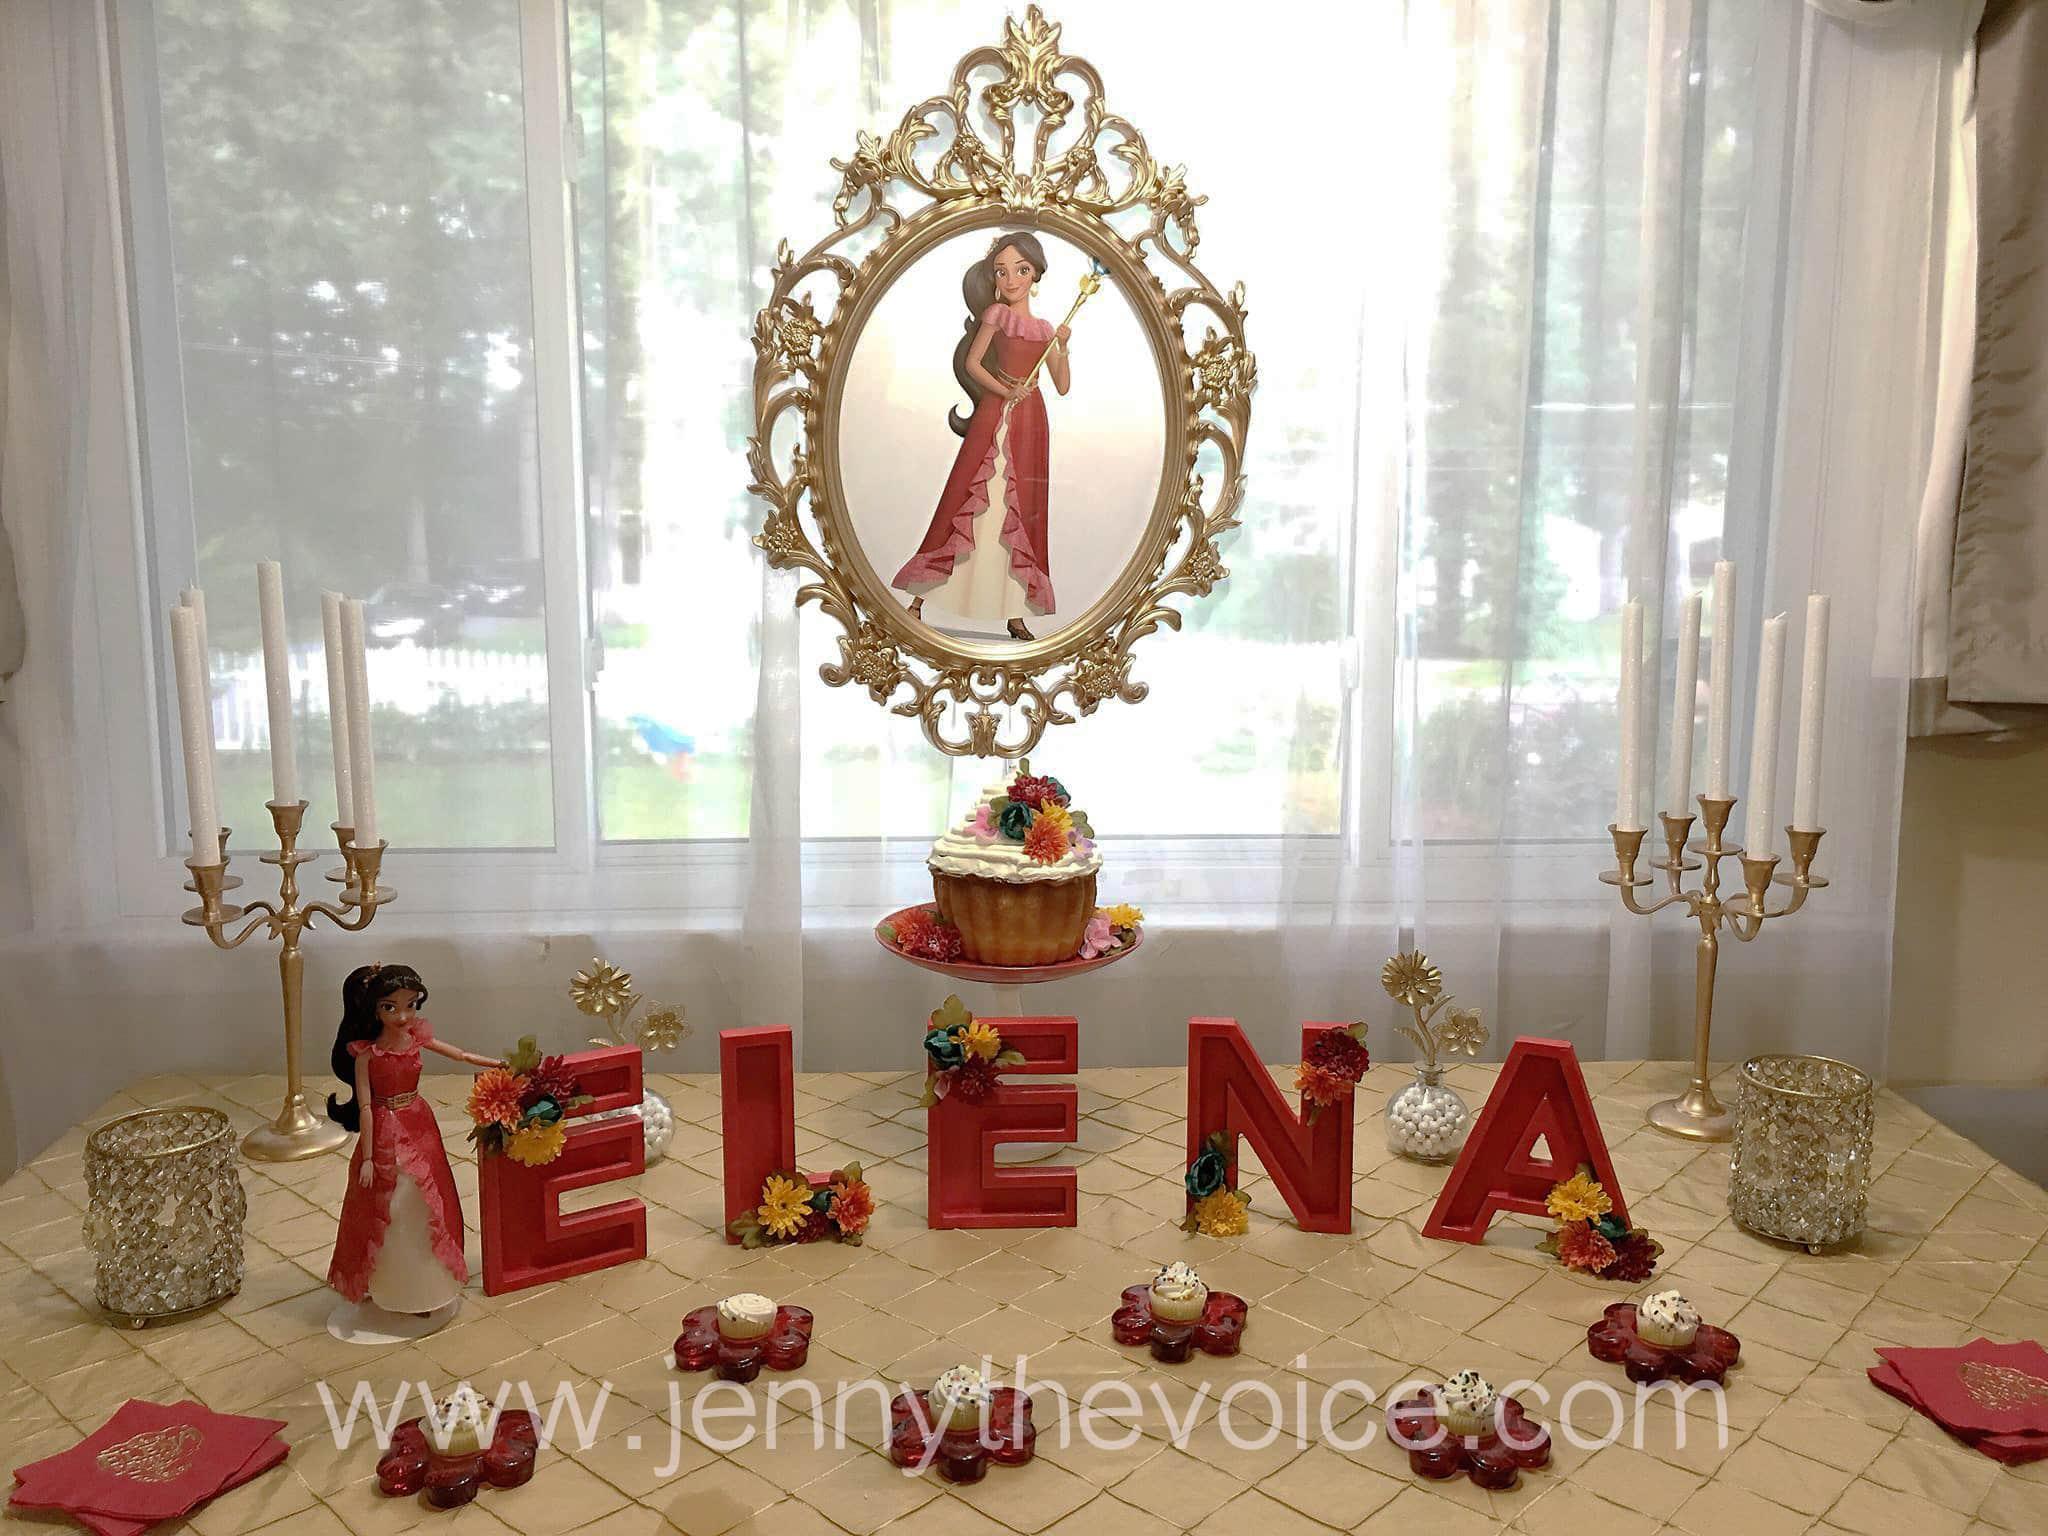 Elena-Of-Avalor-Party-Decoration-IdeasElena-Of-Avalor-Party-Decoration-Ideas